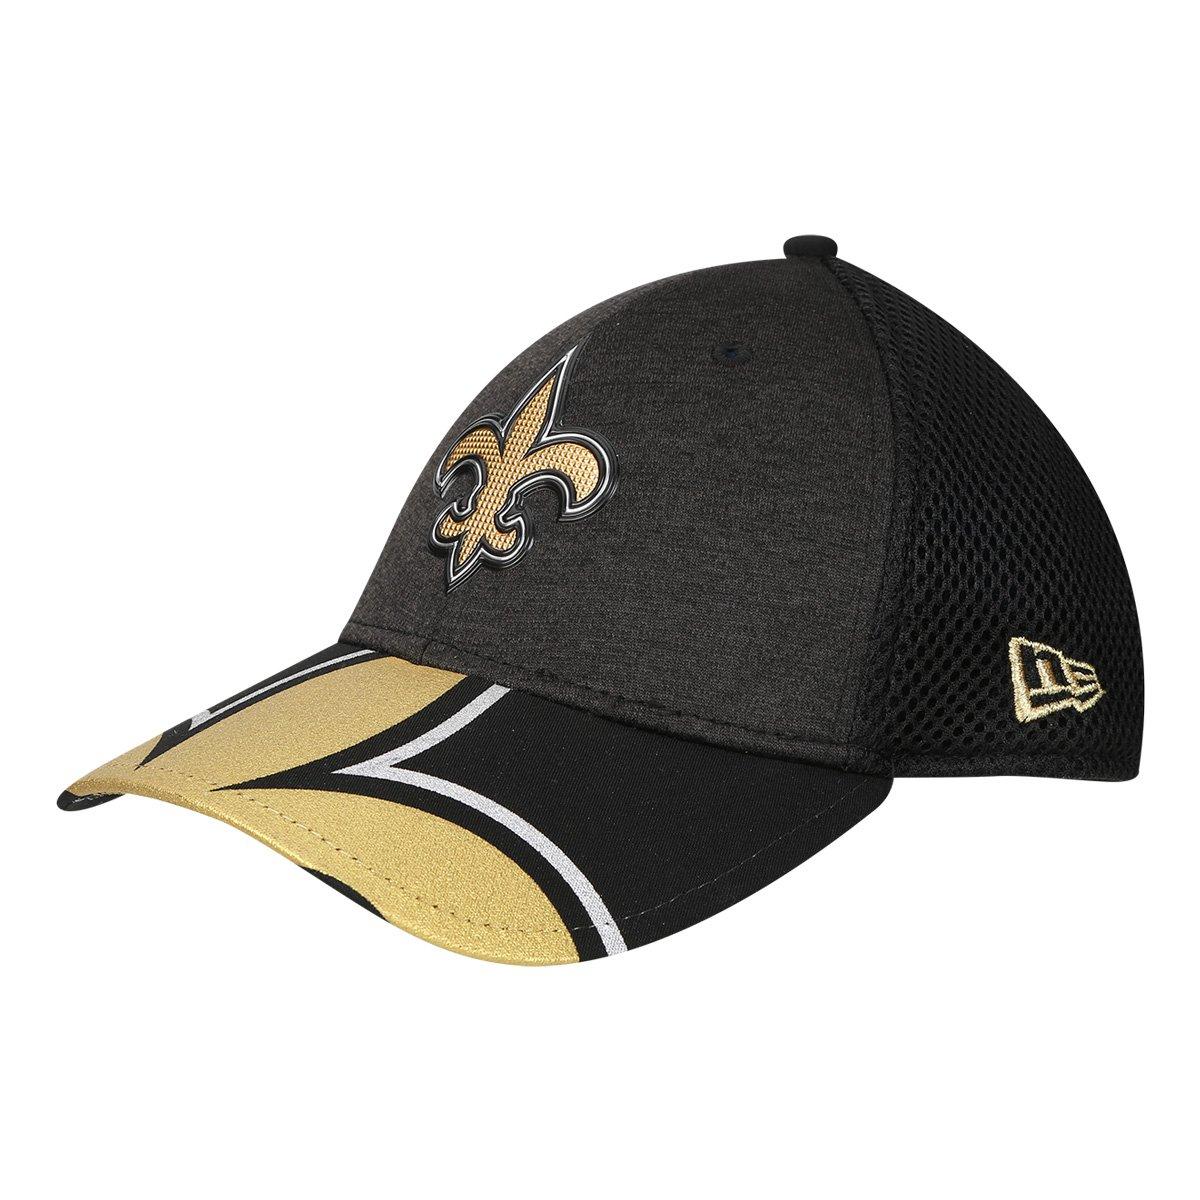 Boné New Era NFL New Orleans Saints Aba Curva 3930 On Stage Masculino -  Compre Agora  cfc64443ab8